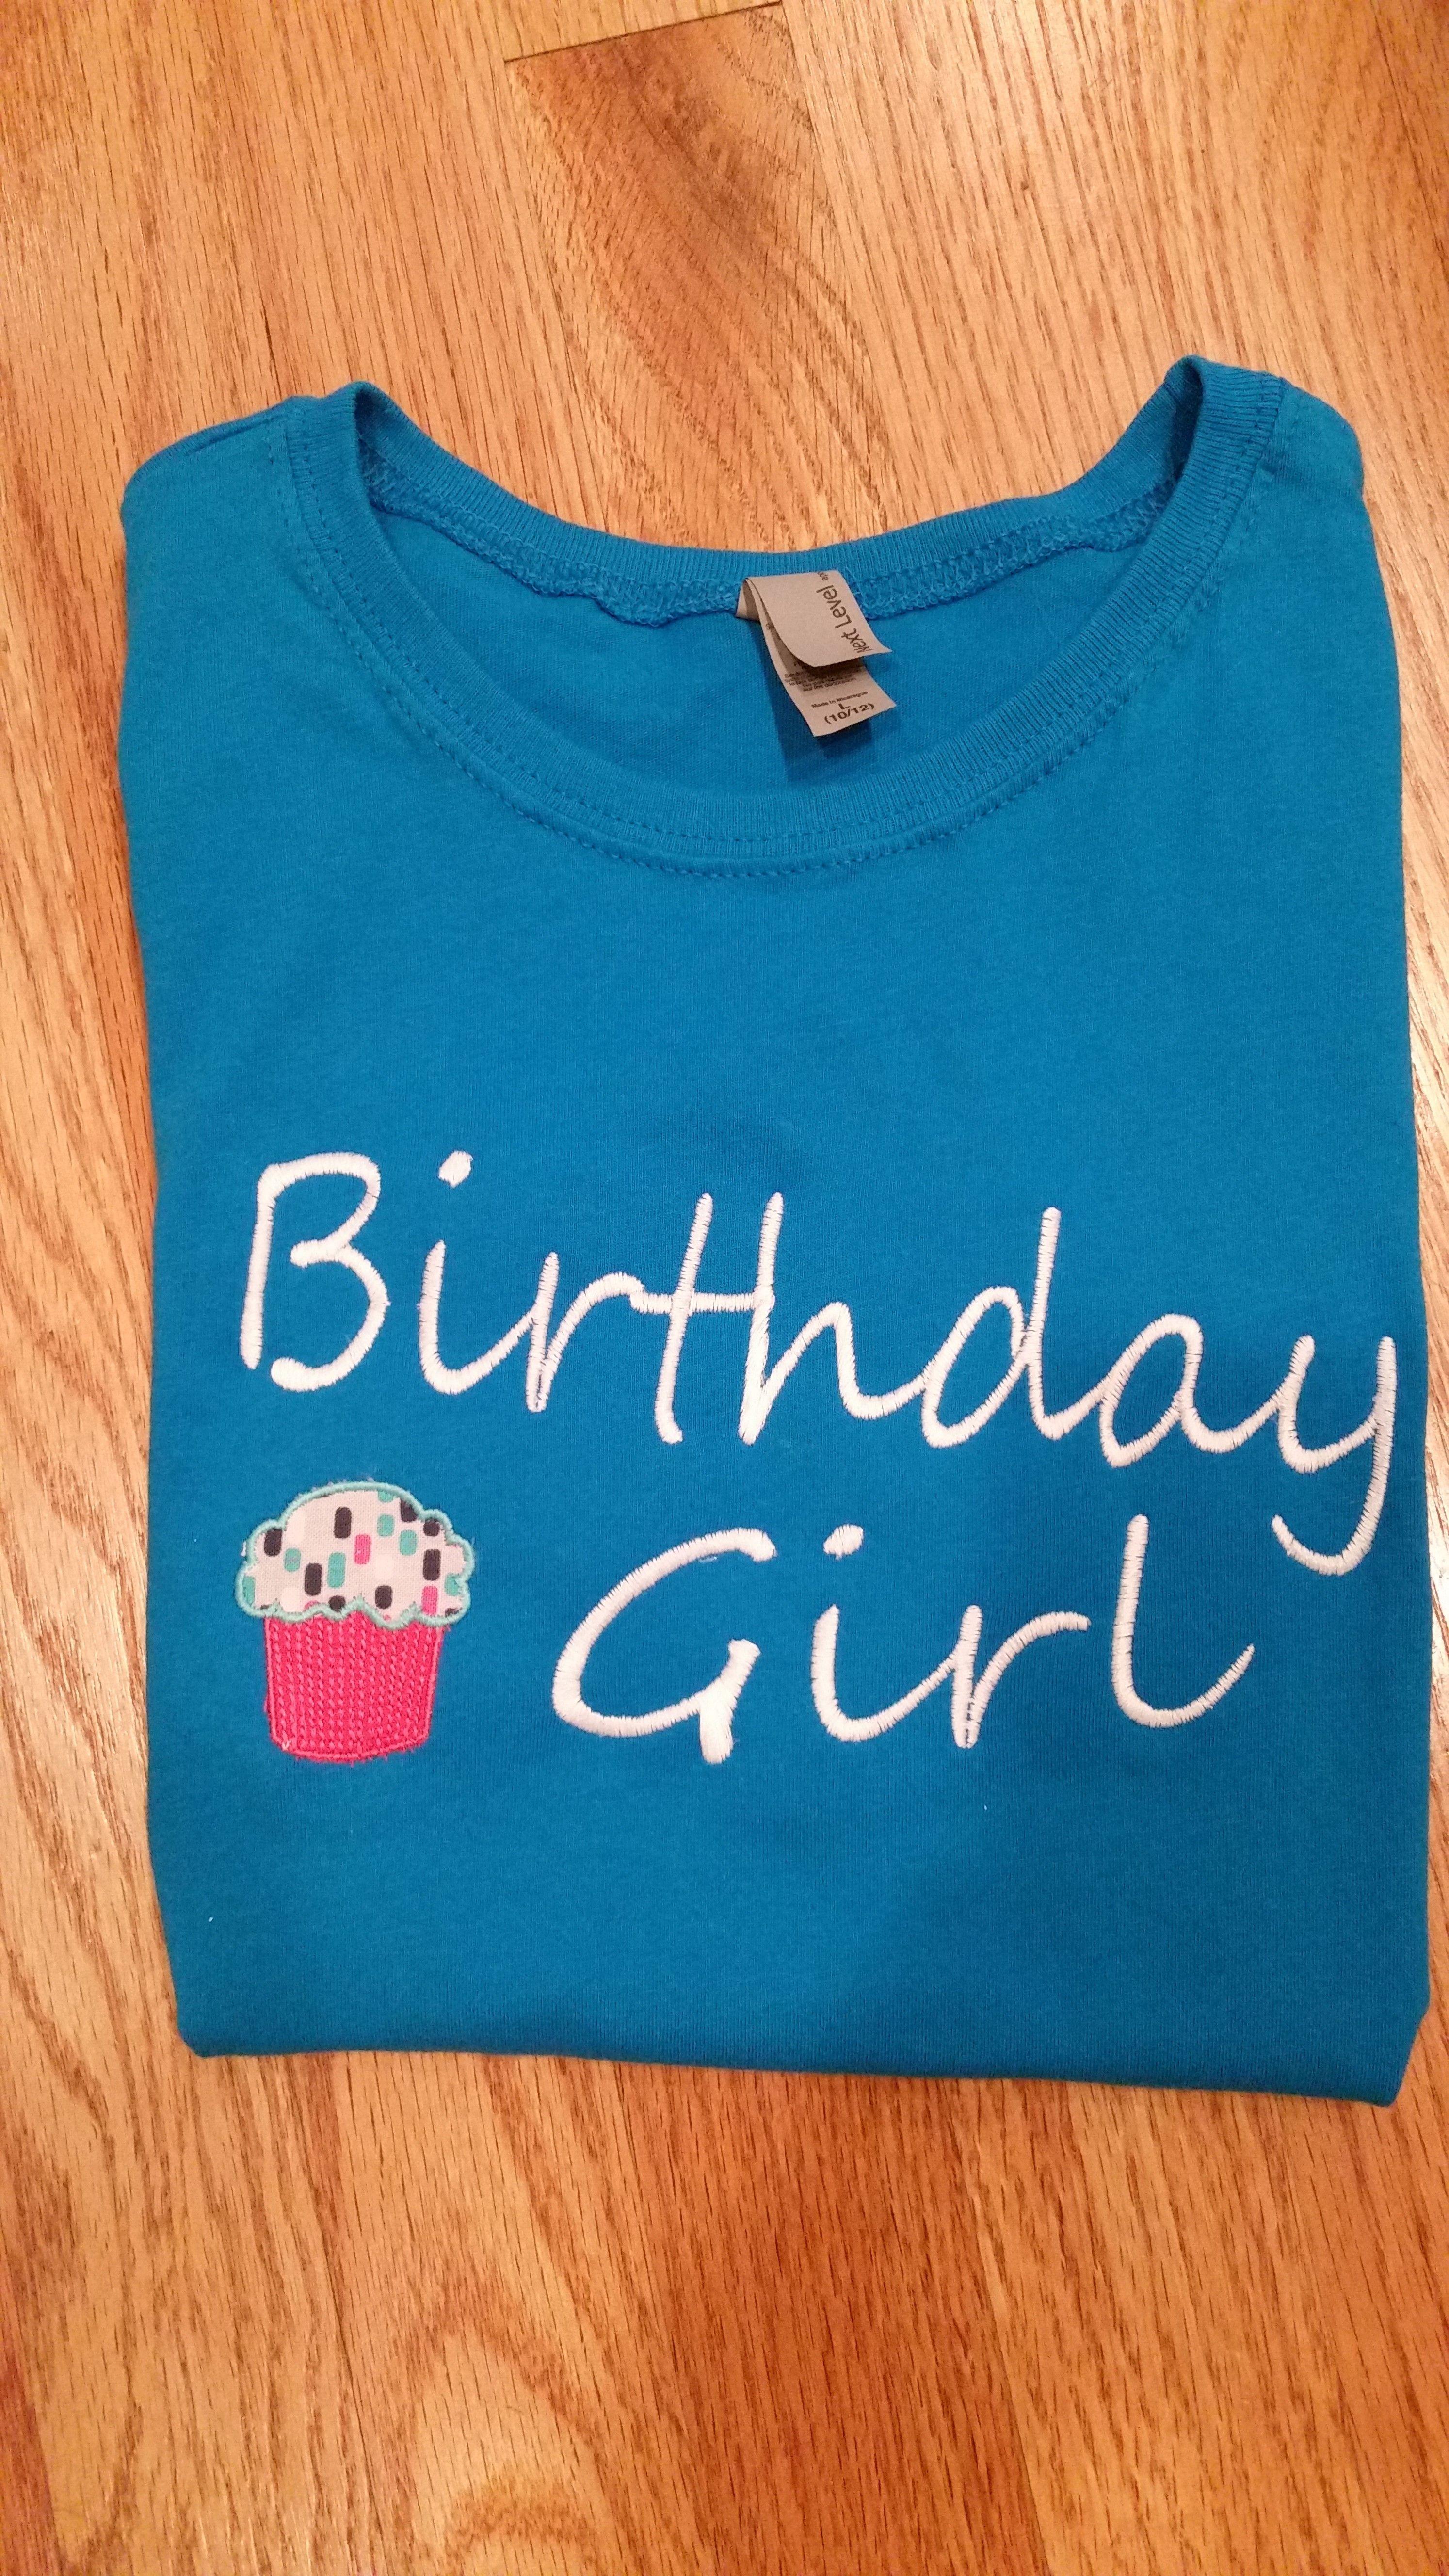 Birthday girl shirt embroidery monogram birthday girl